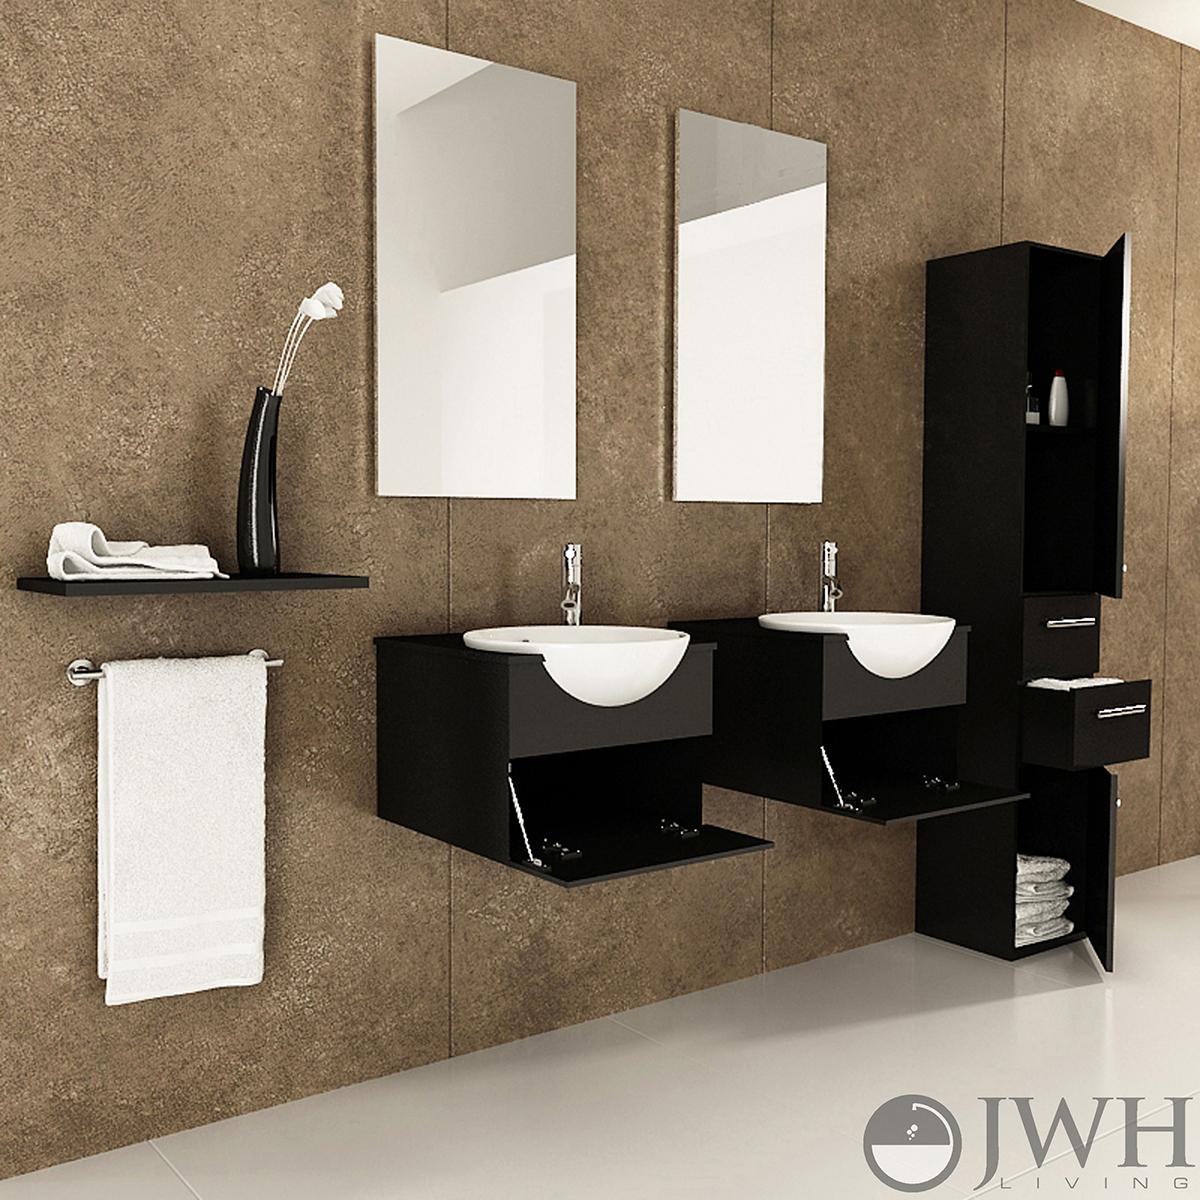 42 Quot Mira Double Bathroom Vanity Espresso Bathgems Com